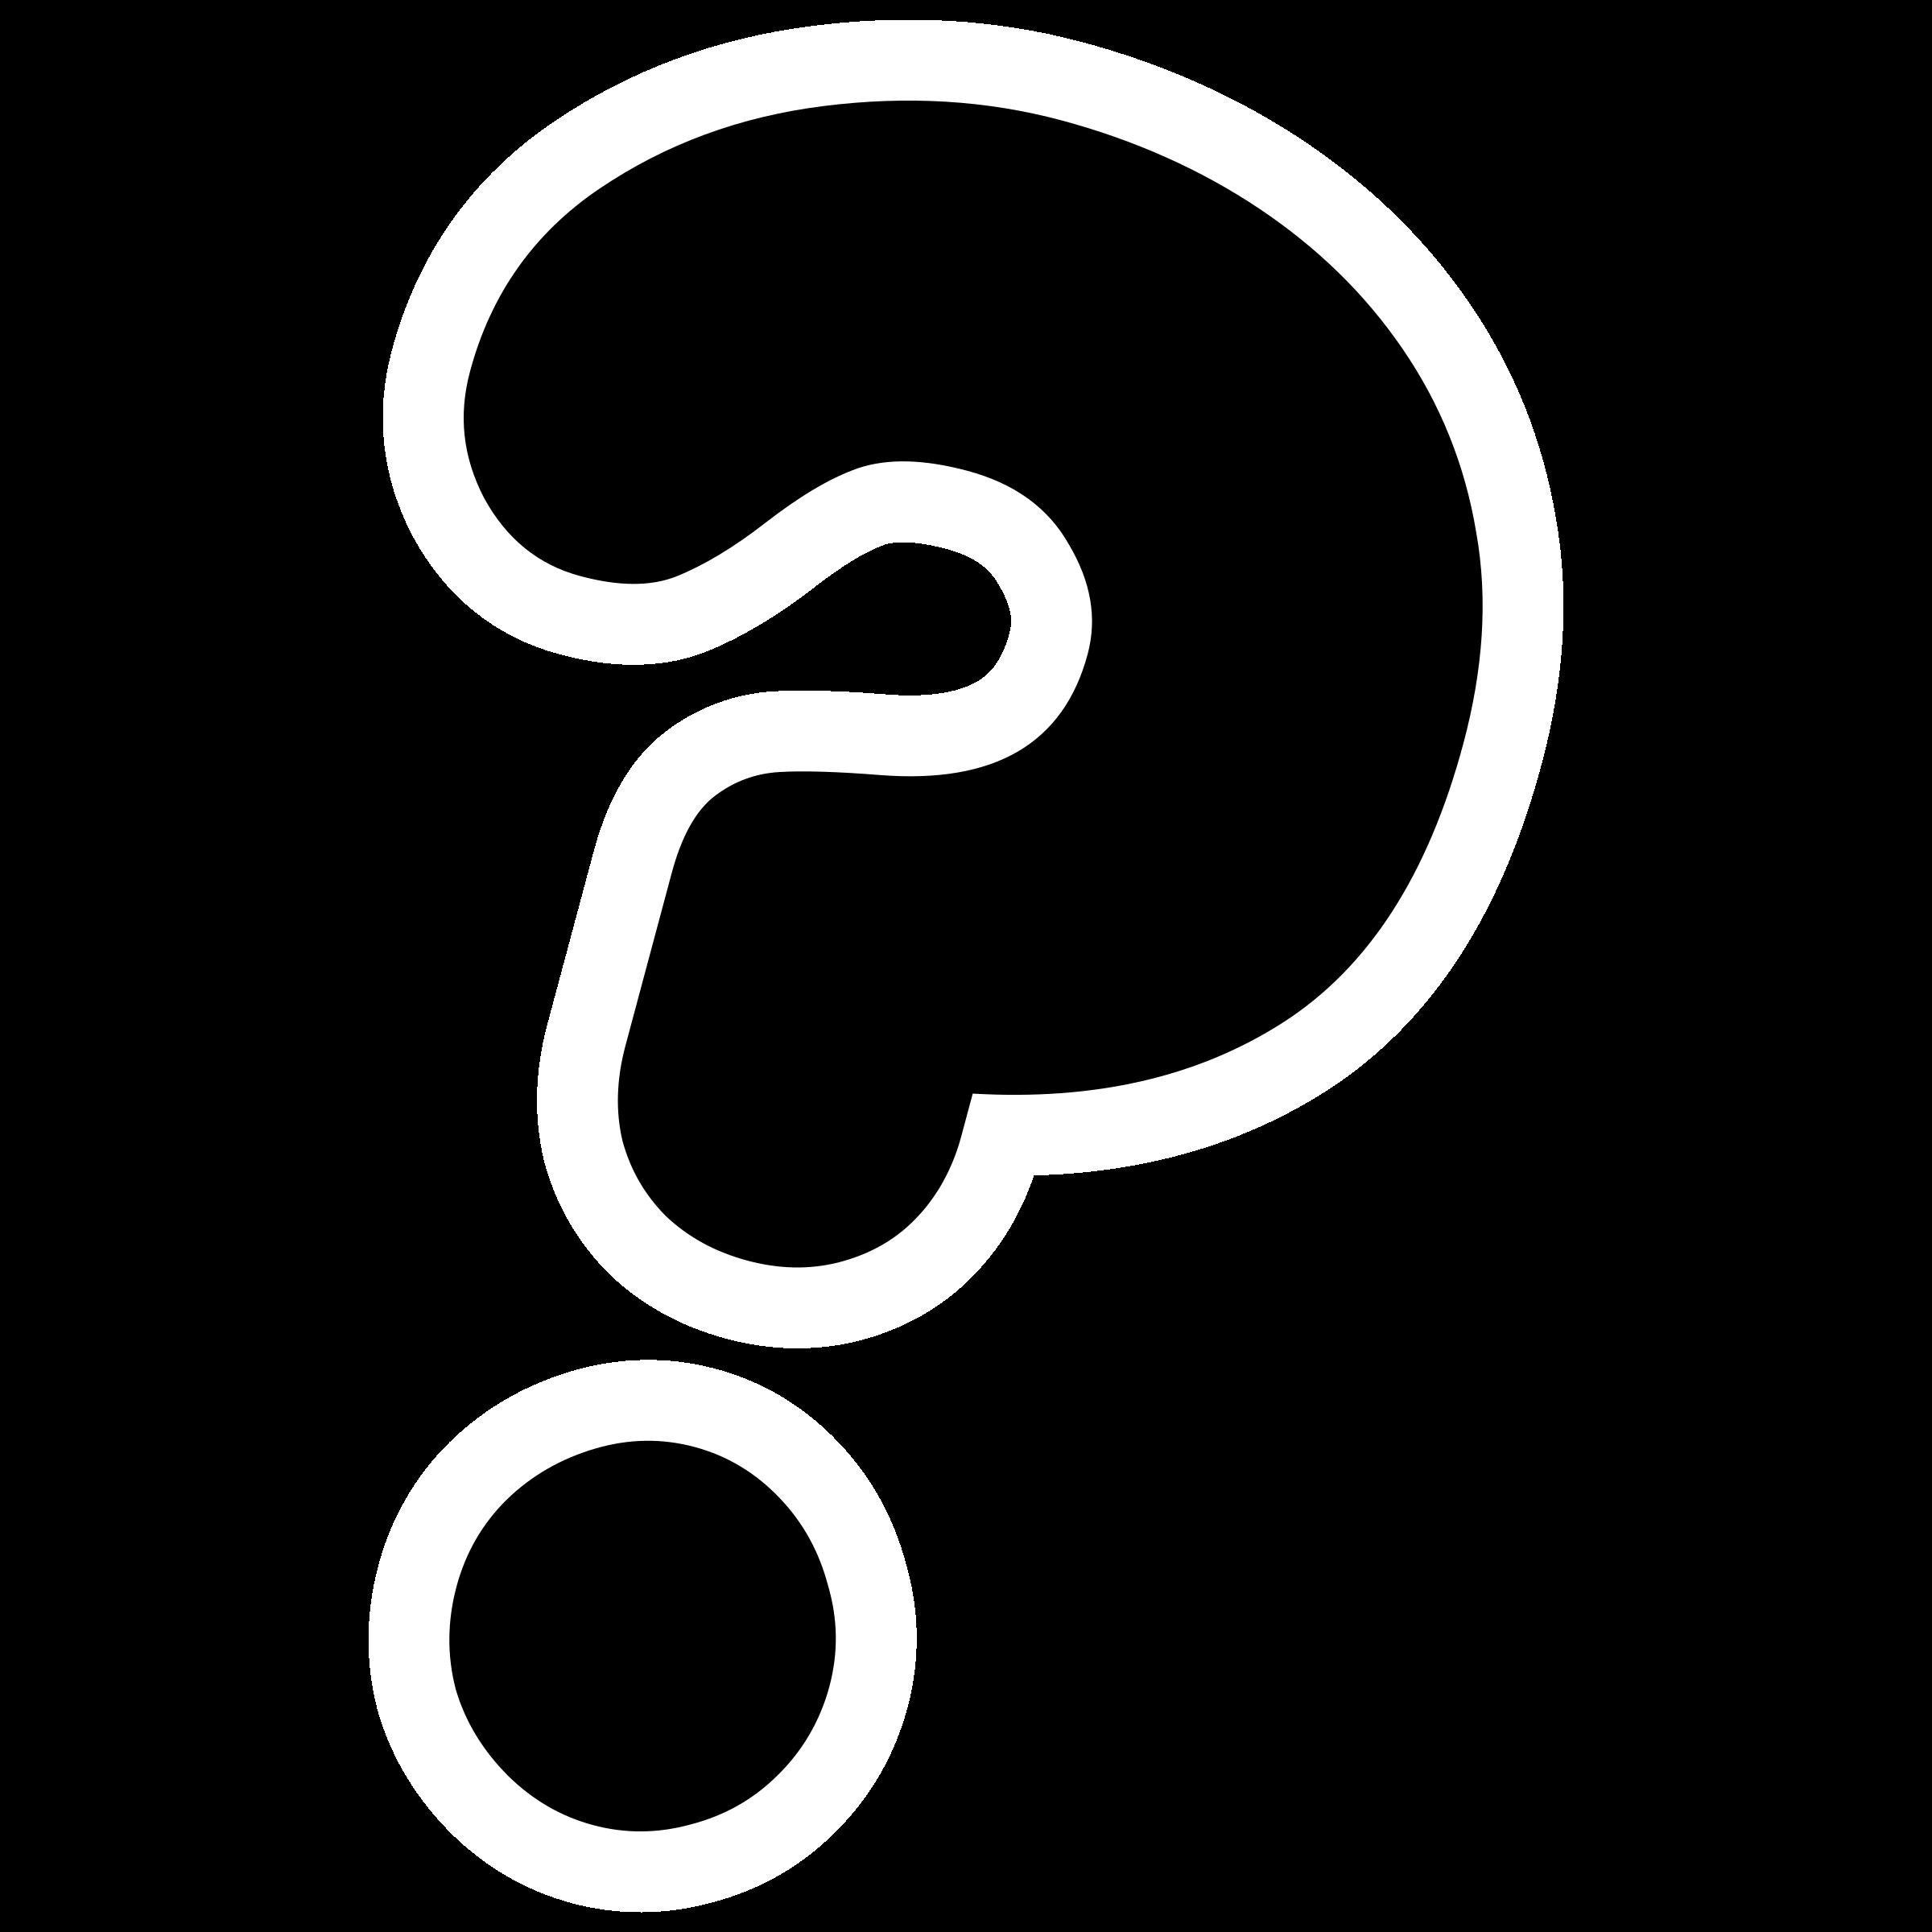 Questions Question Mark Clip Art Microso-Questions question mark clip art microsoft for-18